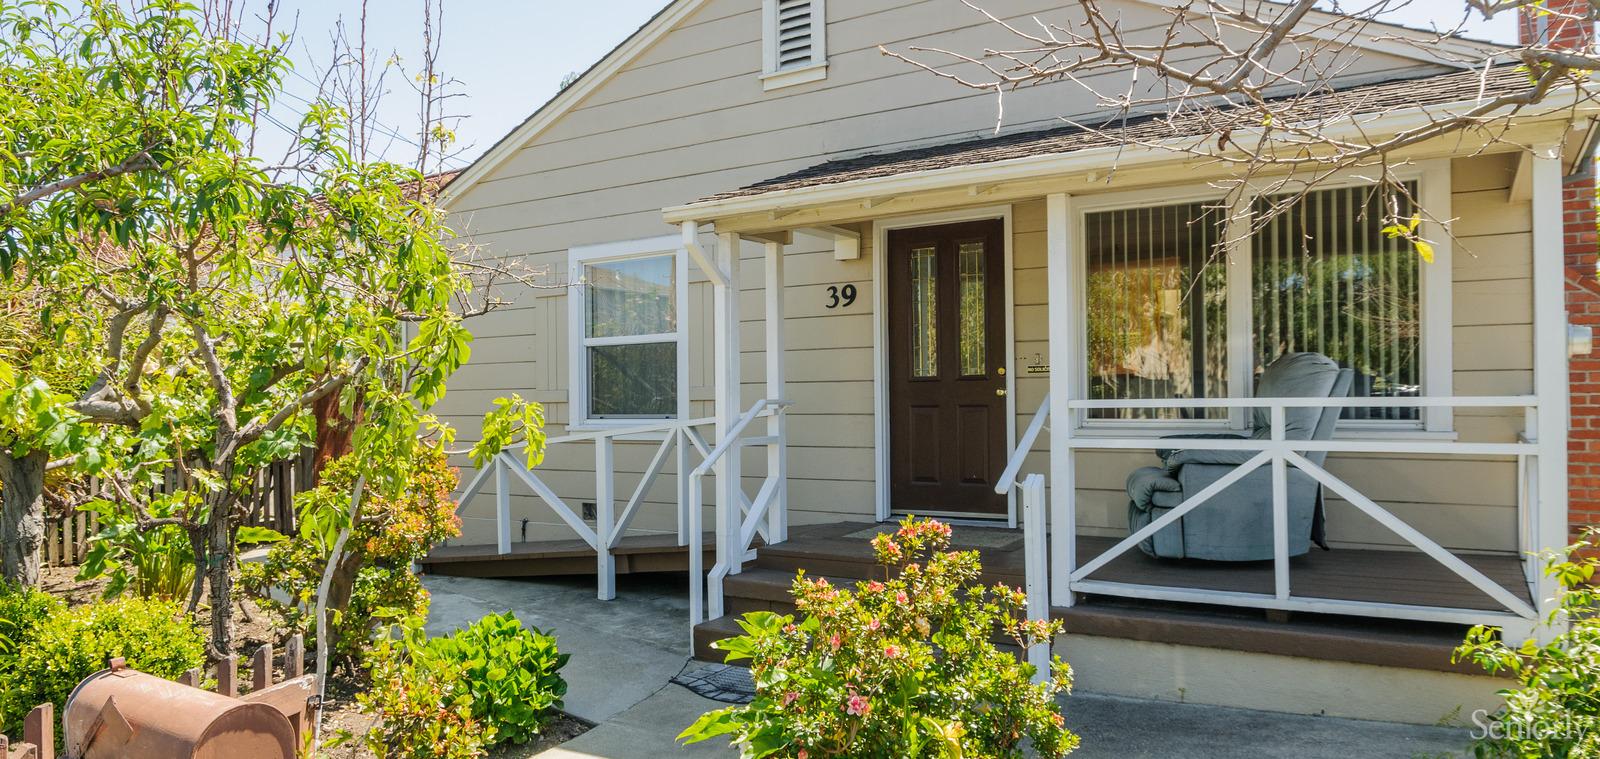 B&B Residential Facilities (39 W)